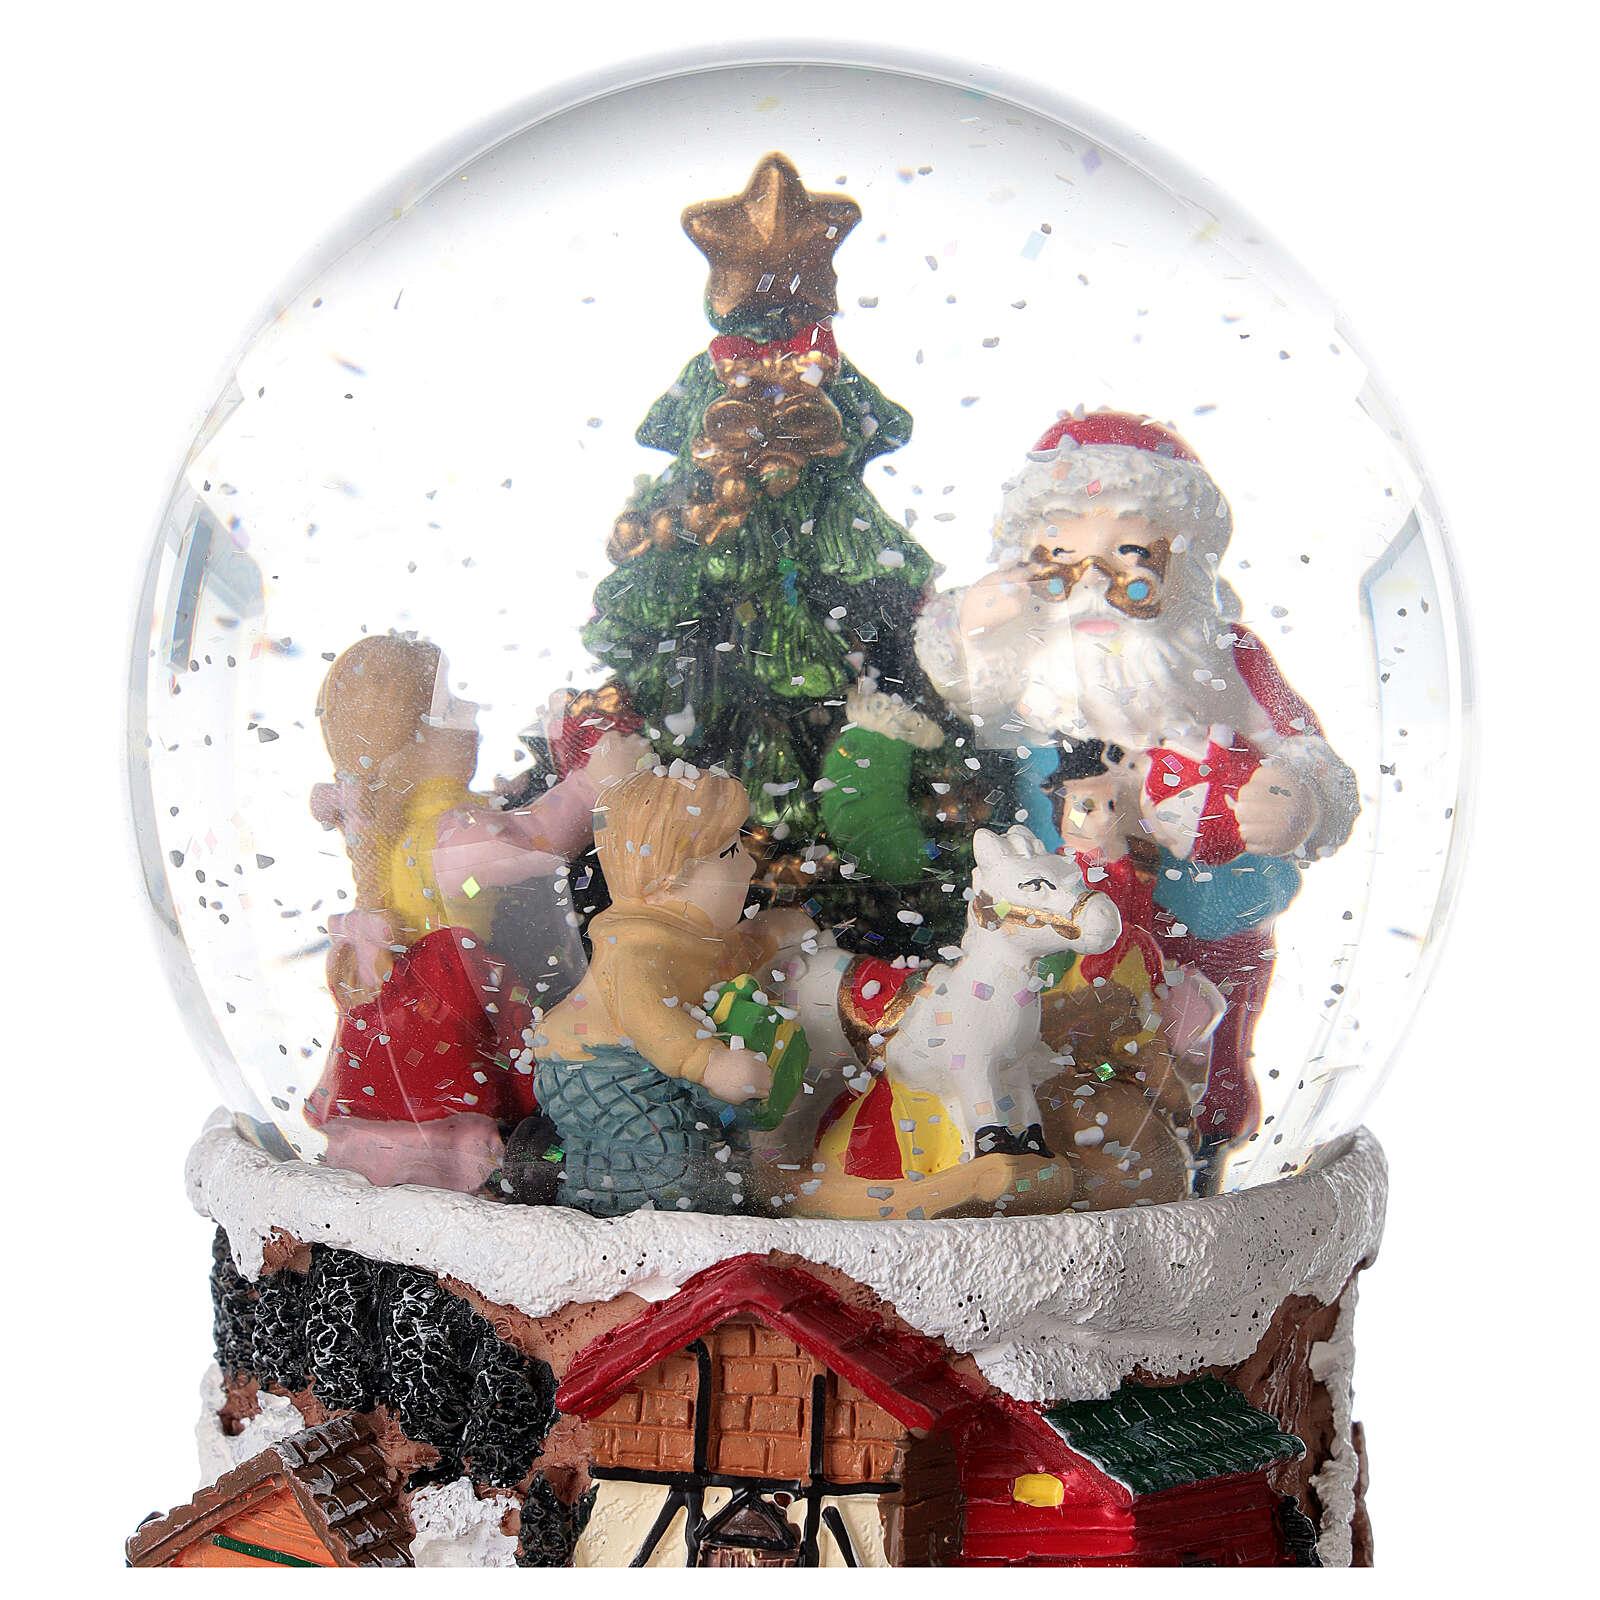 Christmas snow globe rotating music Santa Claus 15x10x10 cm 3